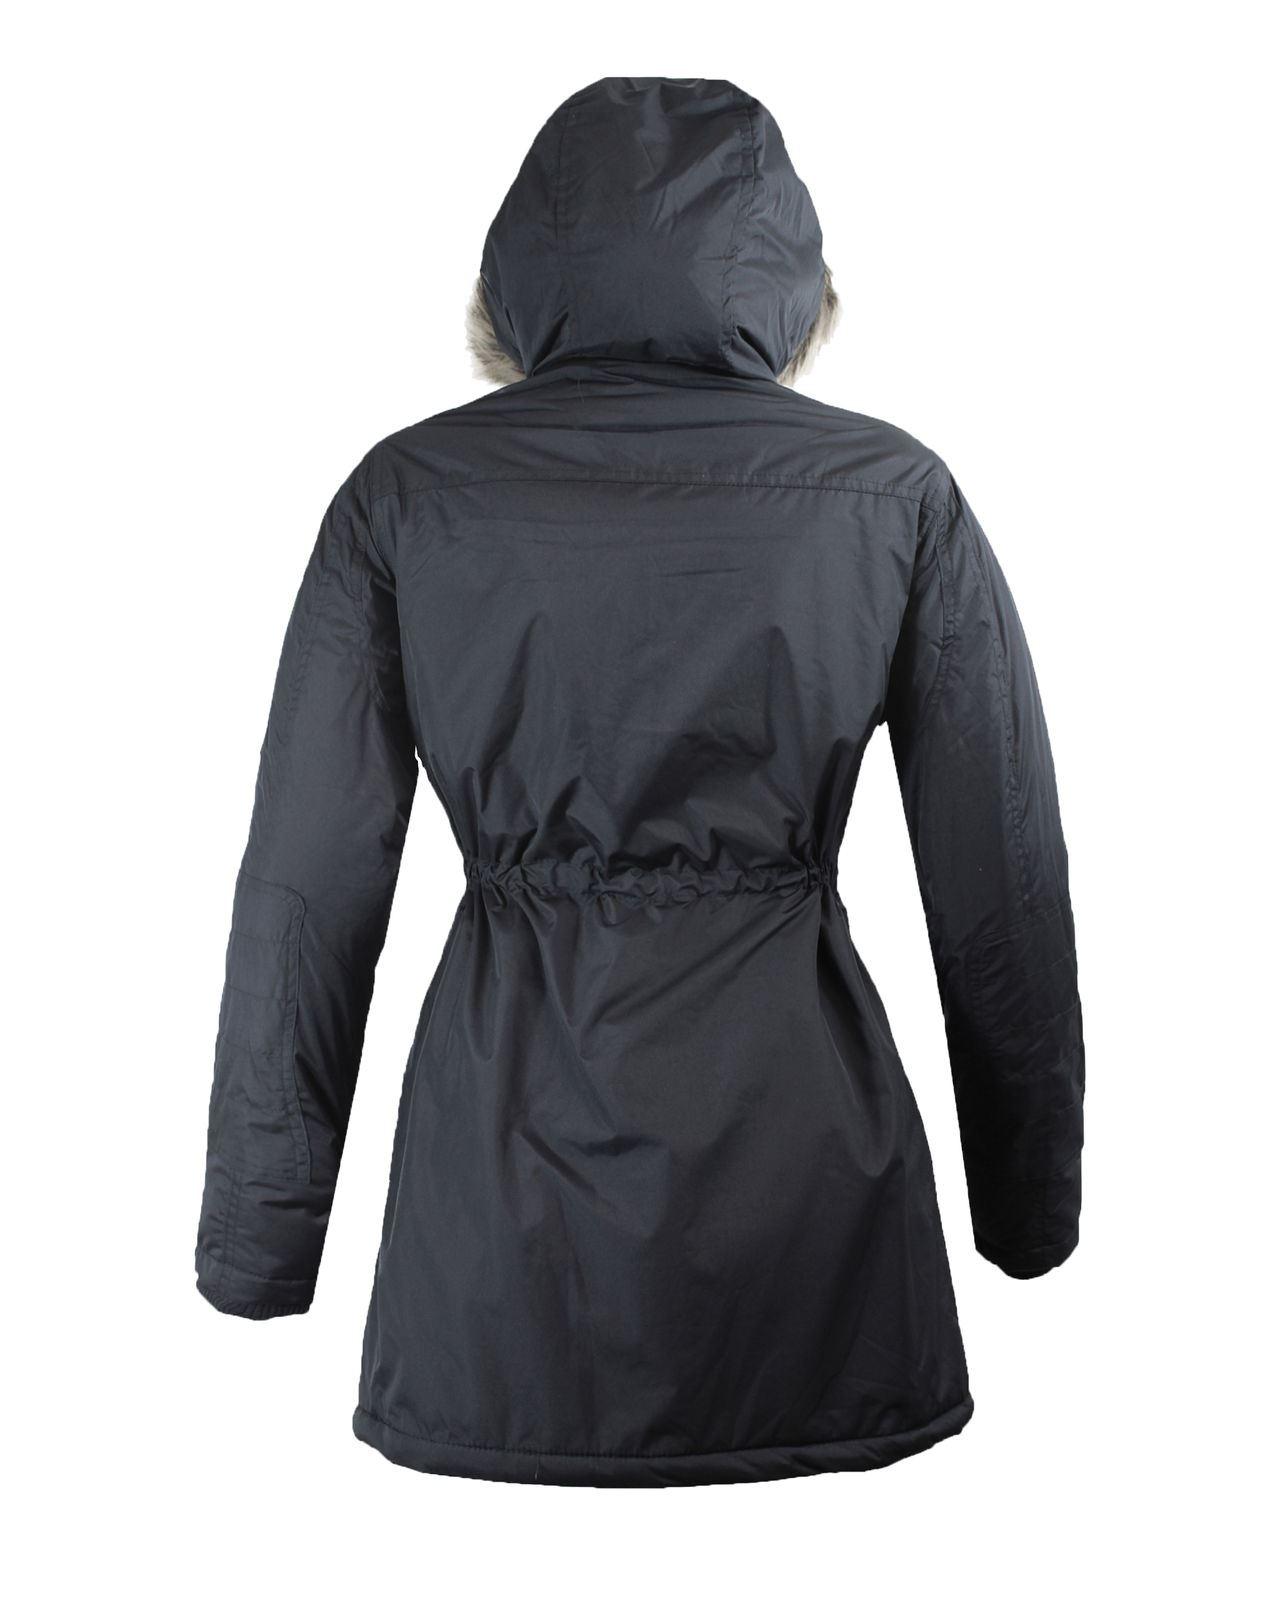 New-Ladies-Womens-Fur-Hooded-Zipped-Parka-Jacket-Pocketed-Coat-Size-10-12-14-166 thumbnail 4